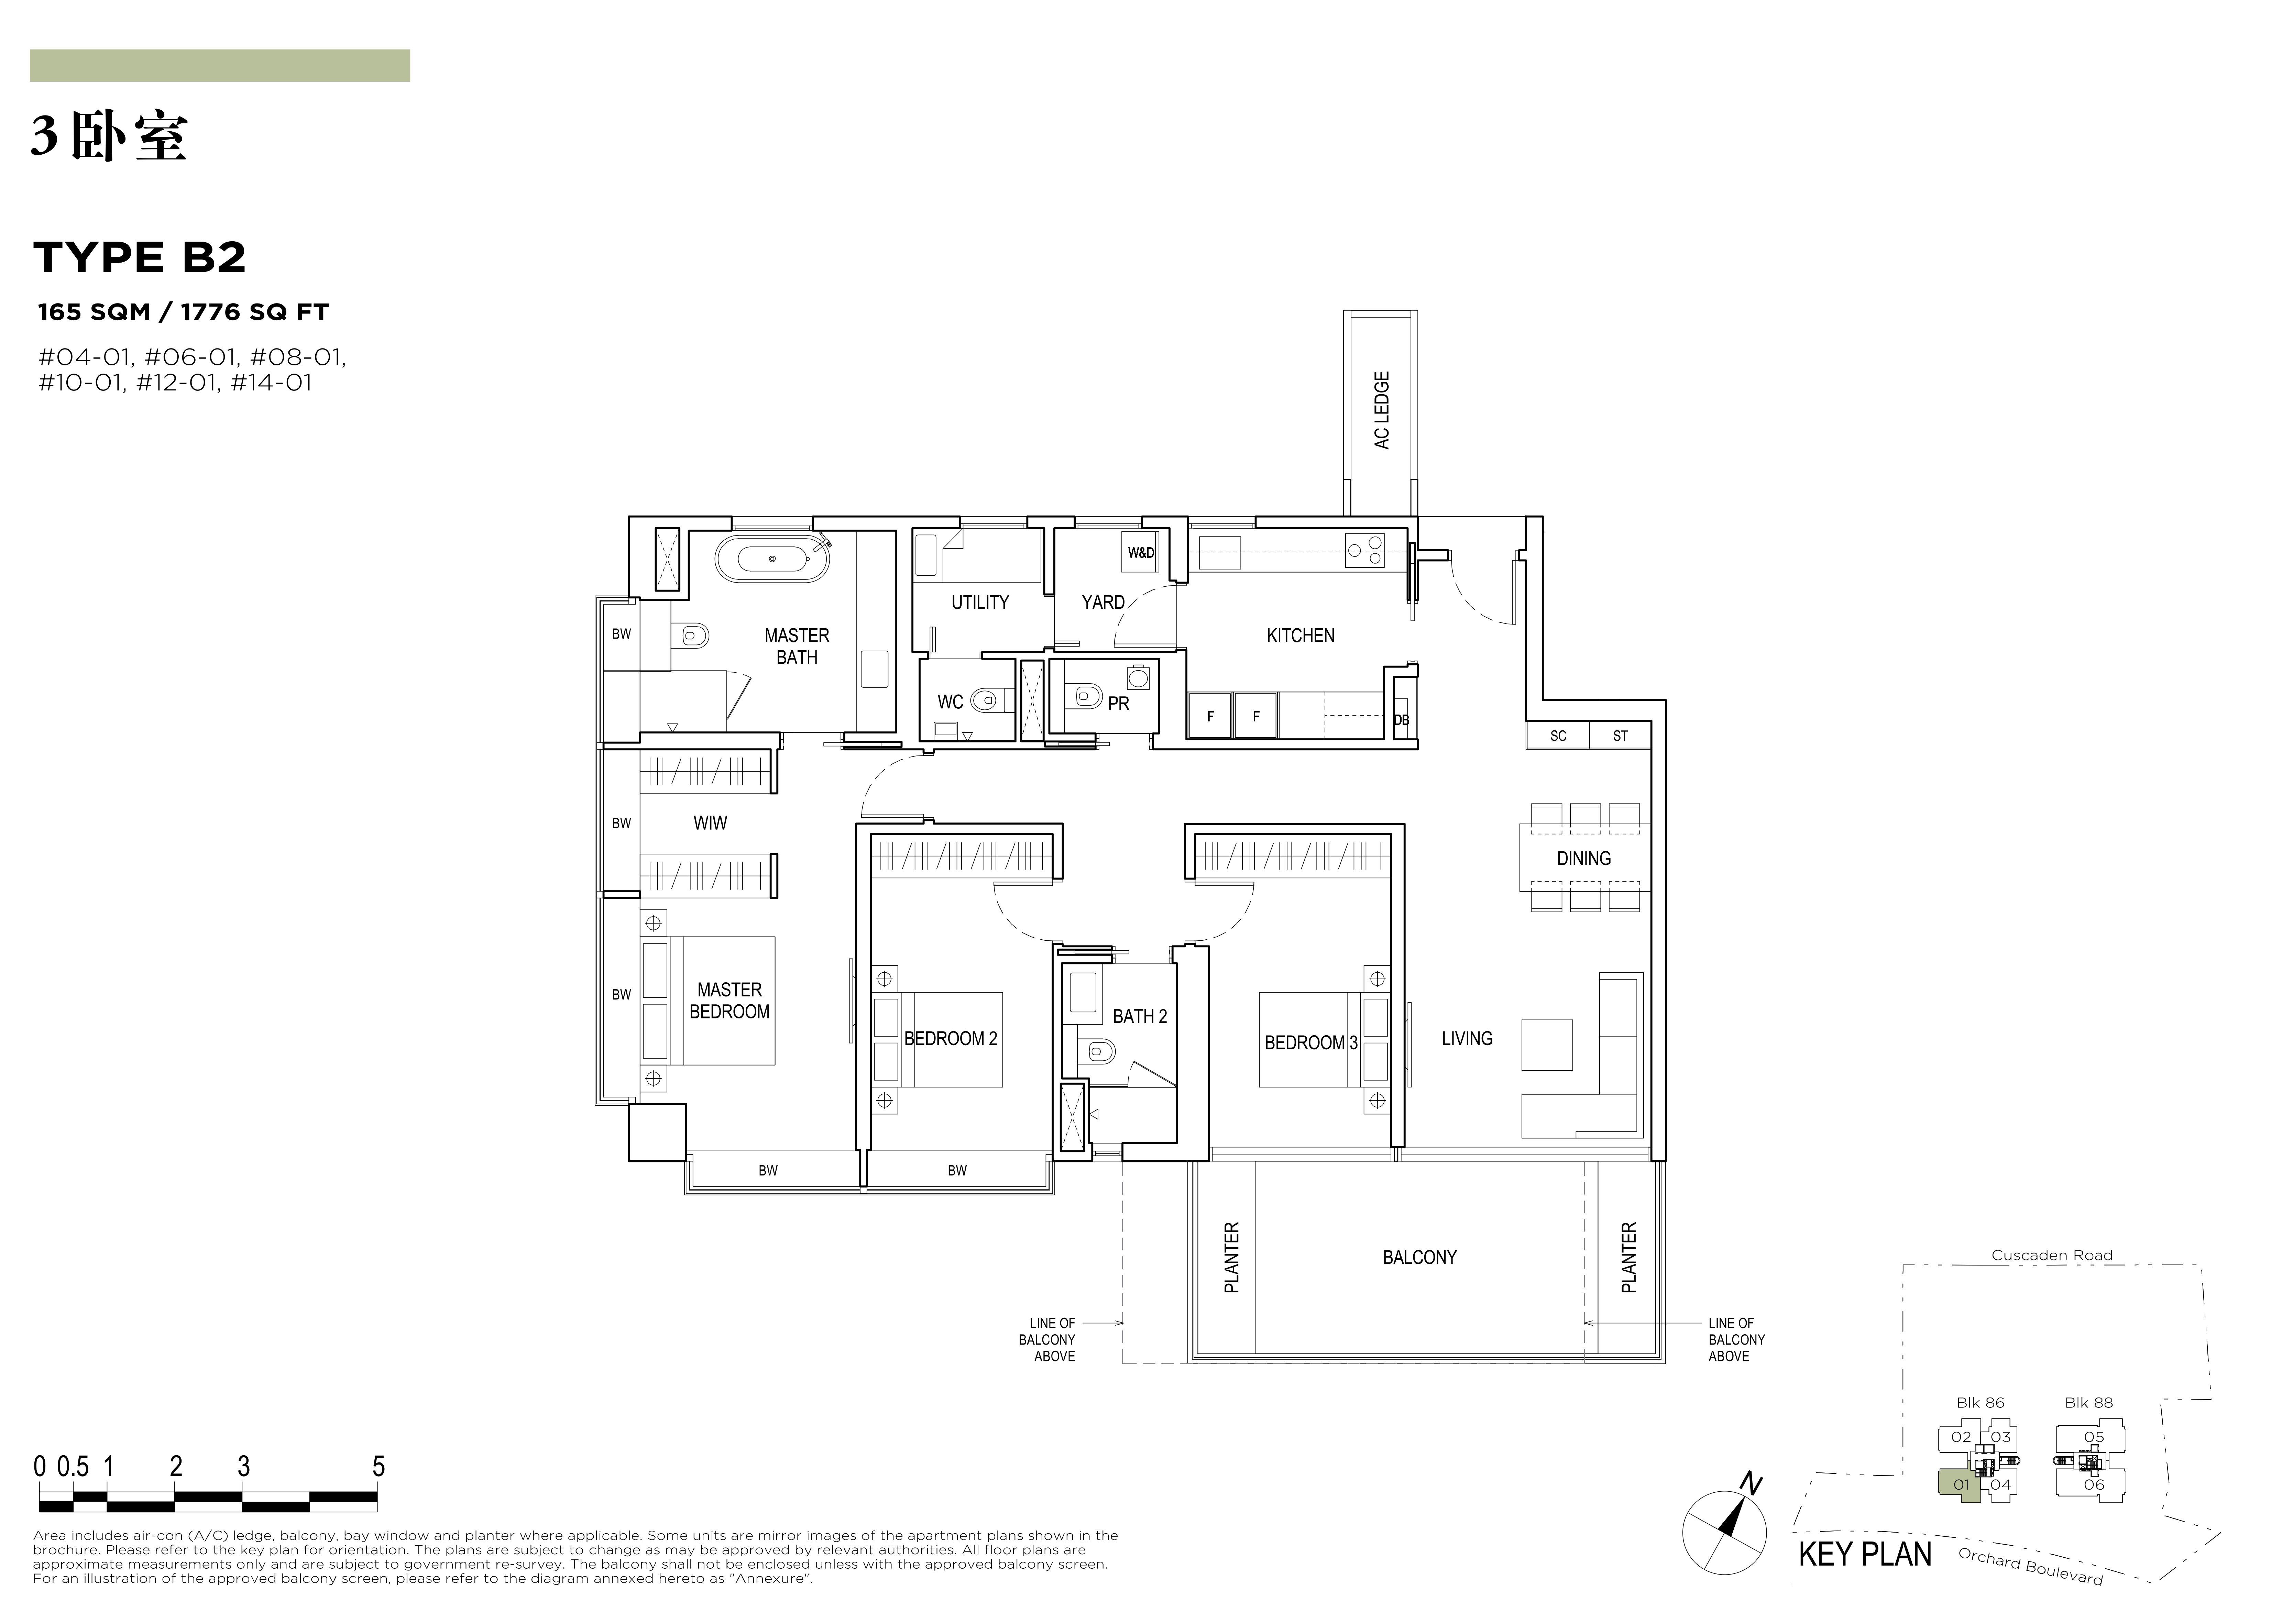 铂瑞雅居 Boulevard 88 floor plan 3 卧房 b2